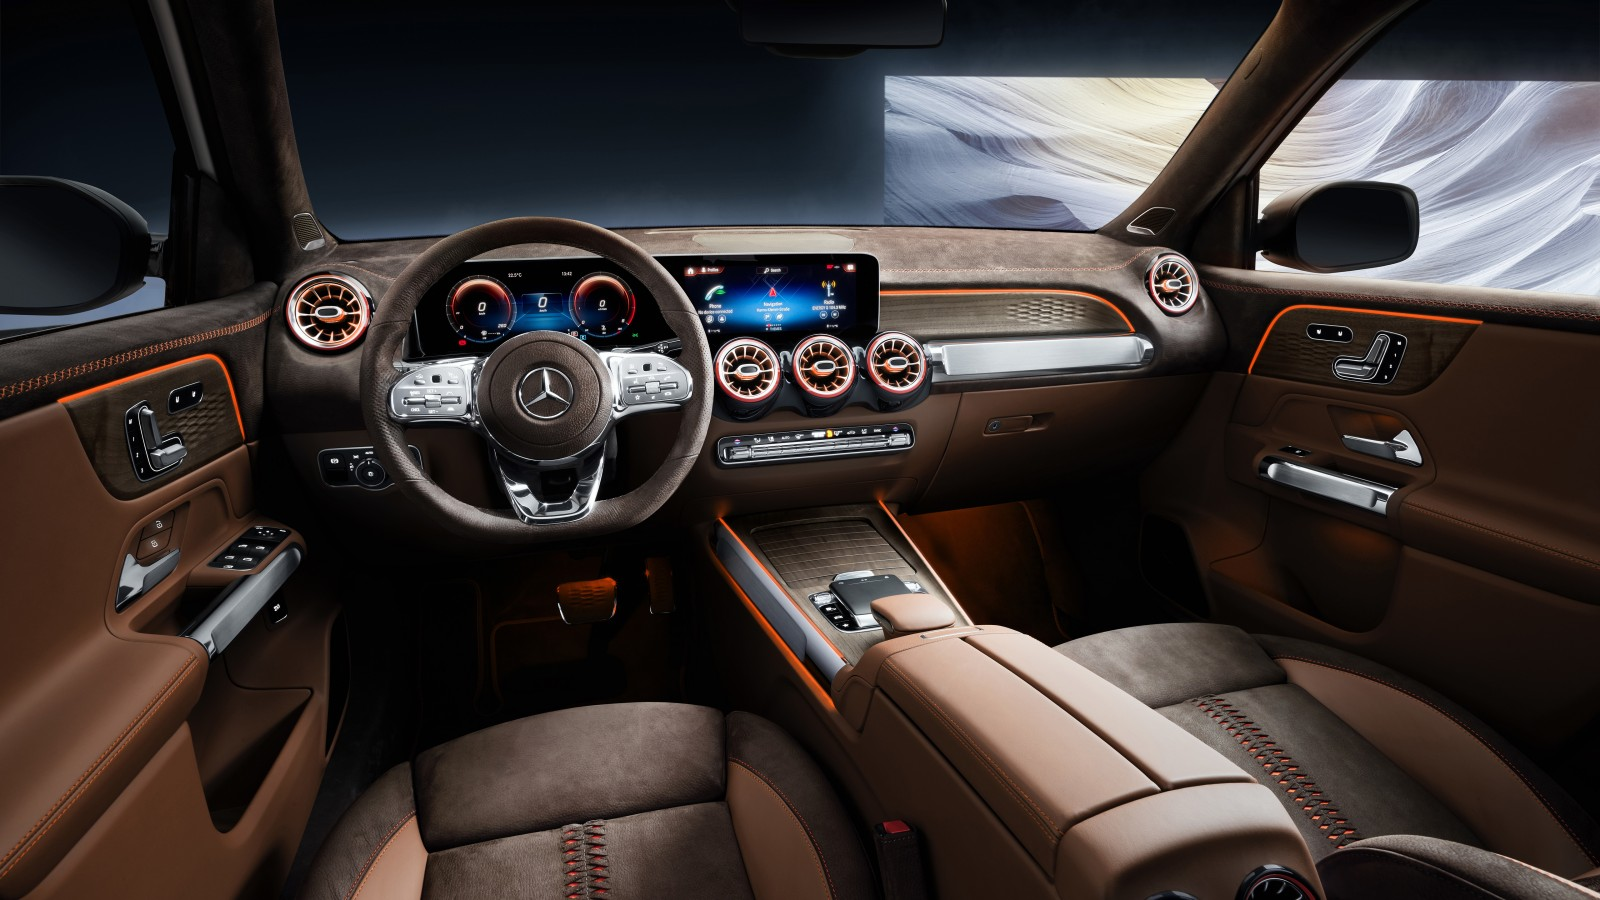 Bmw Coupe 135i Interior